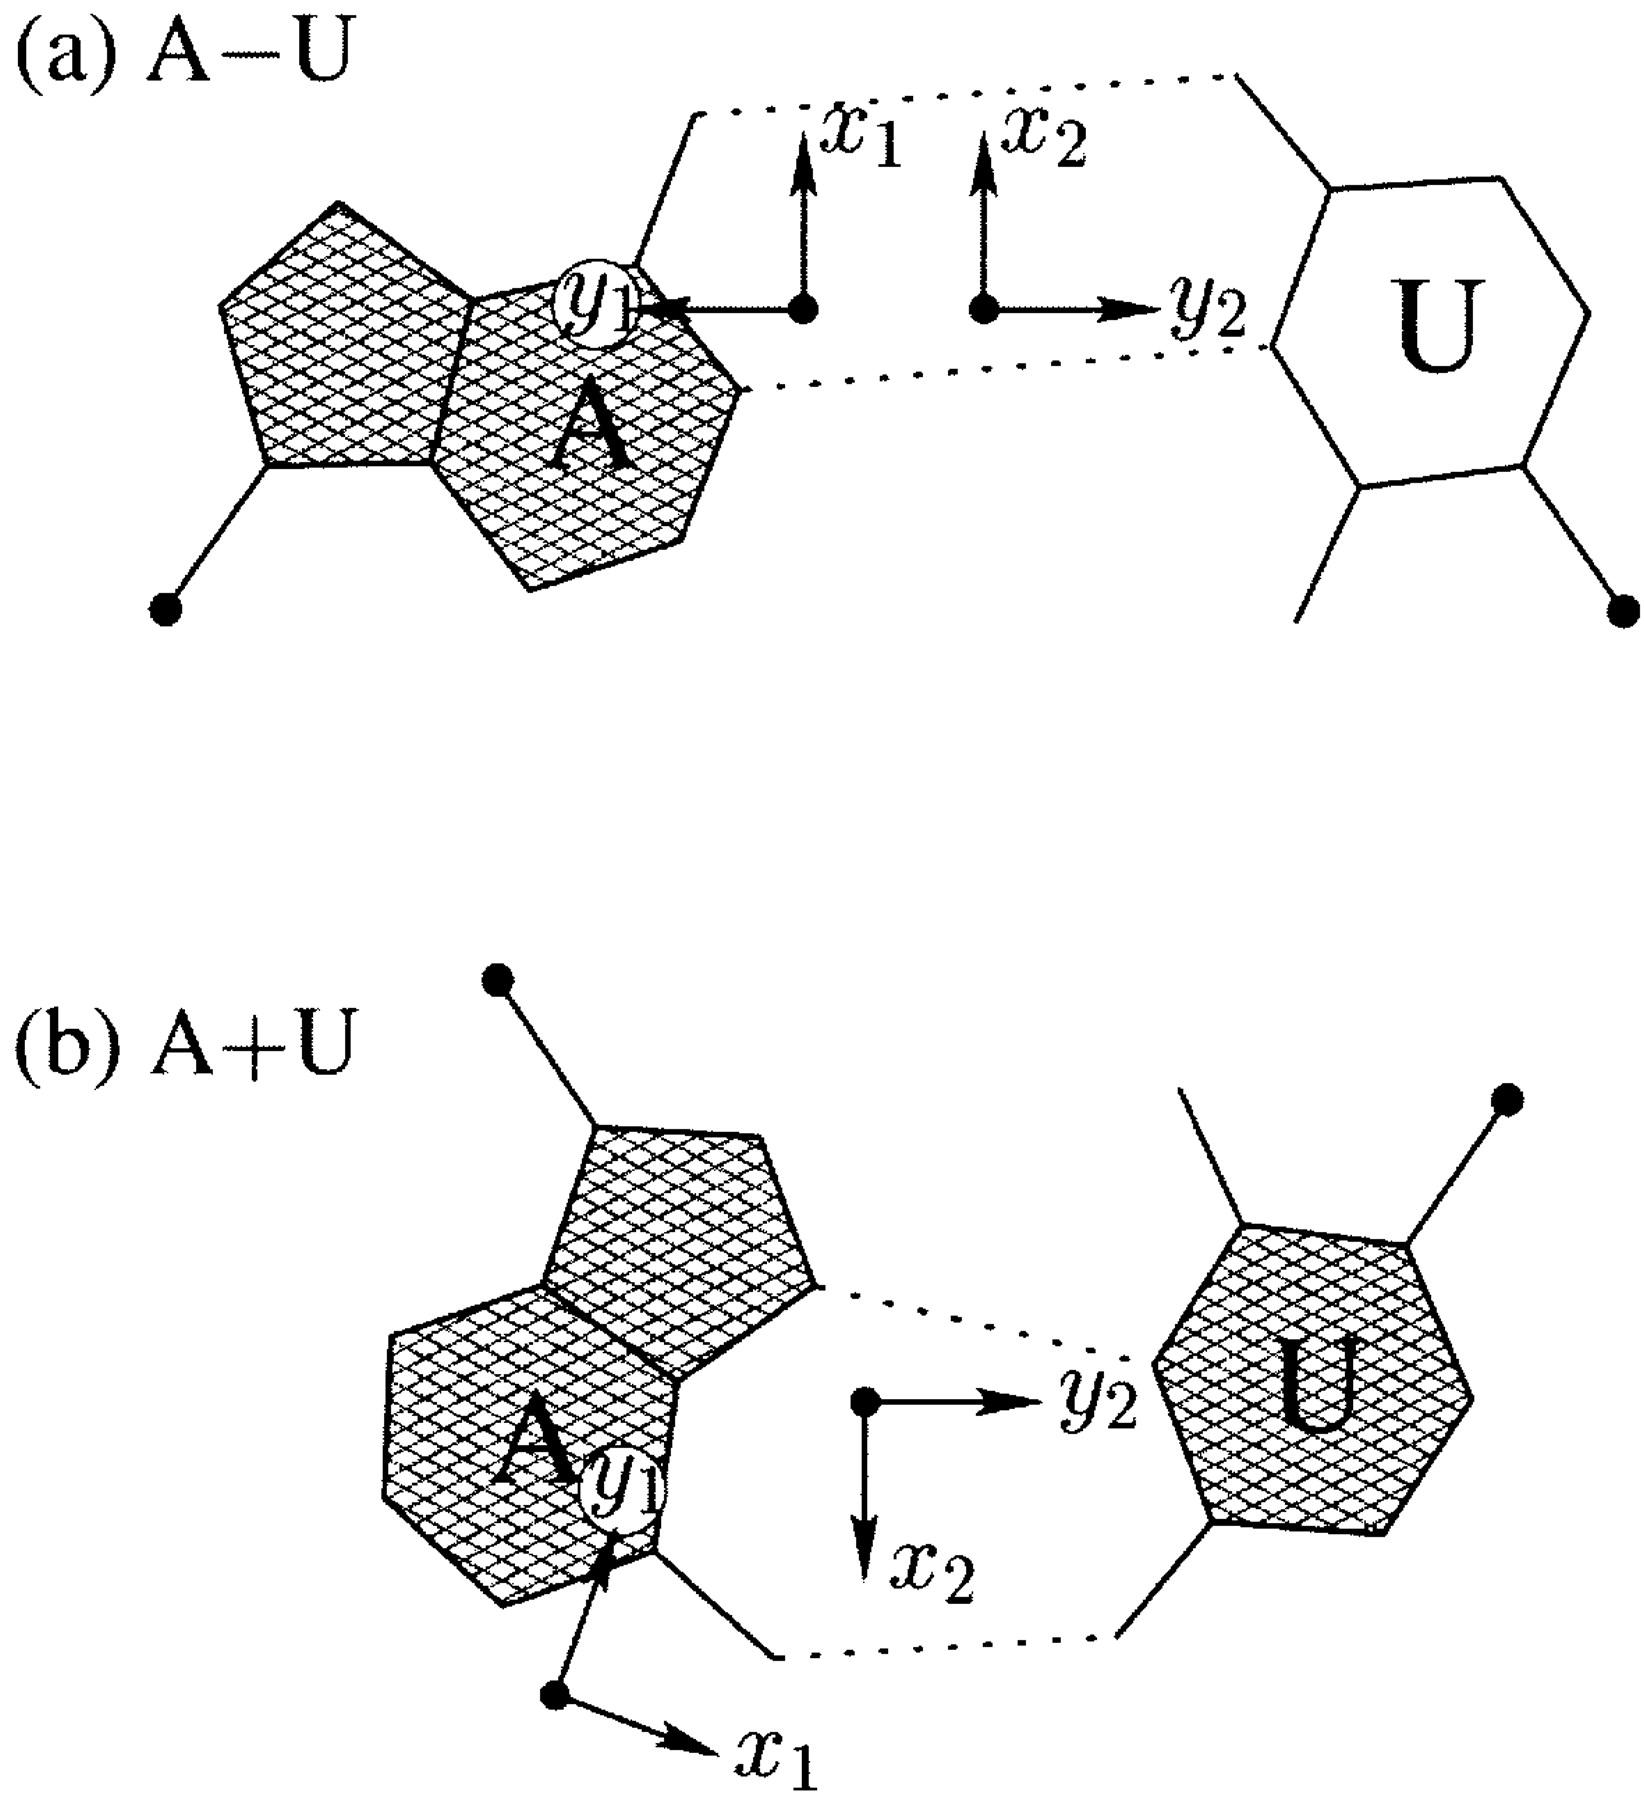 Watson-Crick vs Hoogsteen base pairs